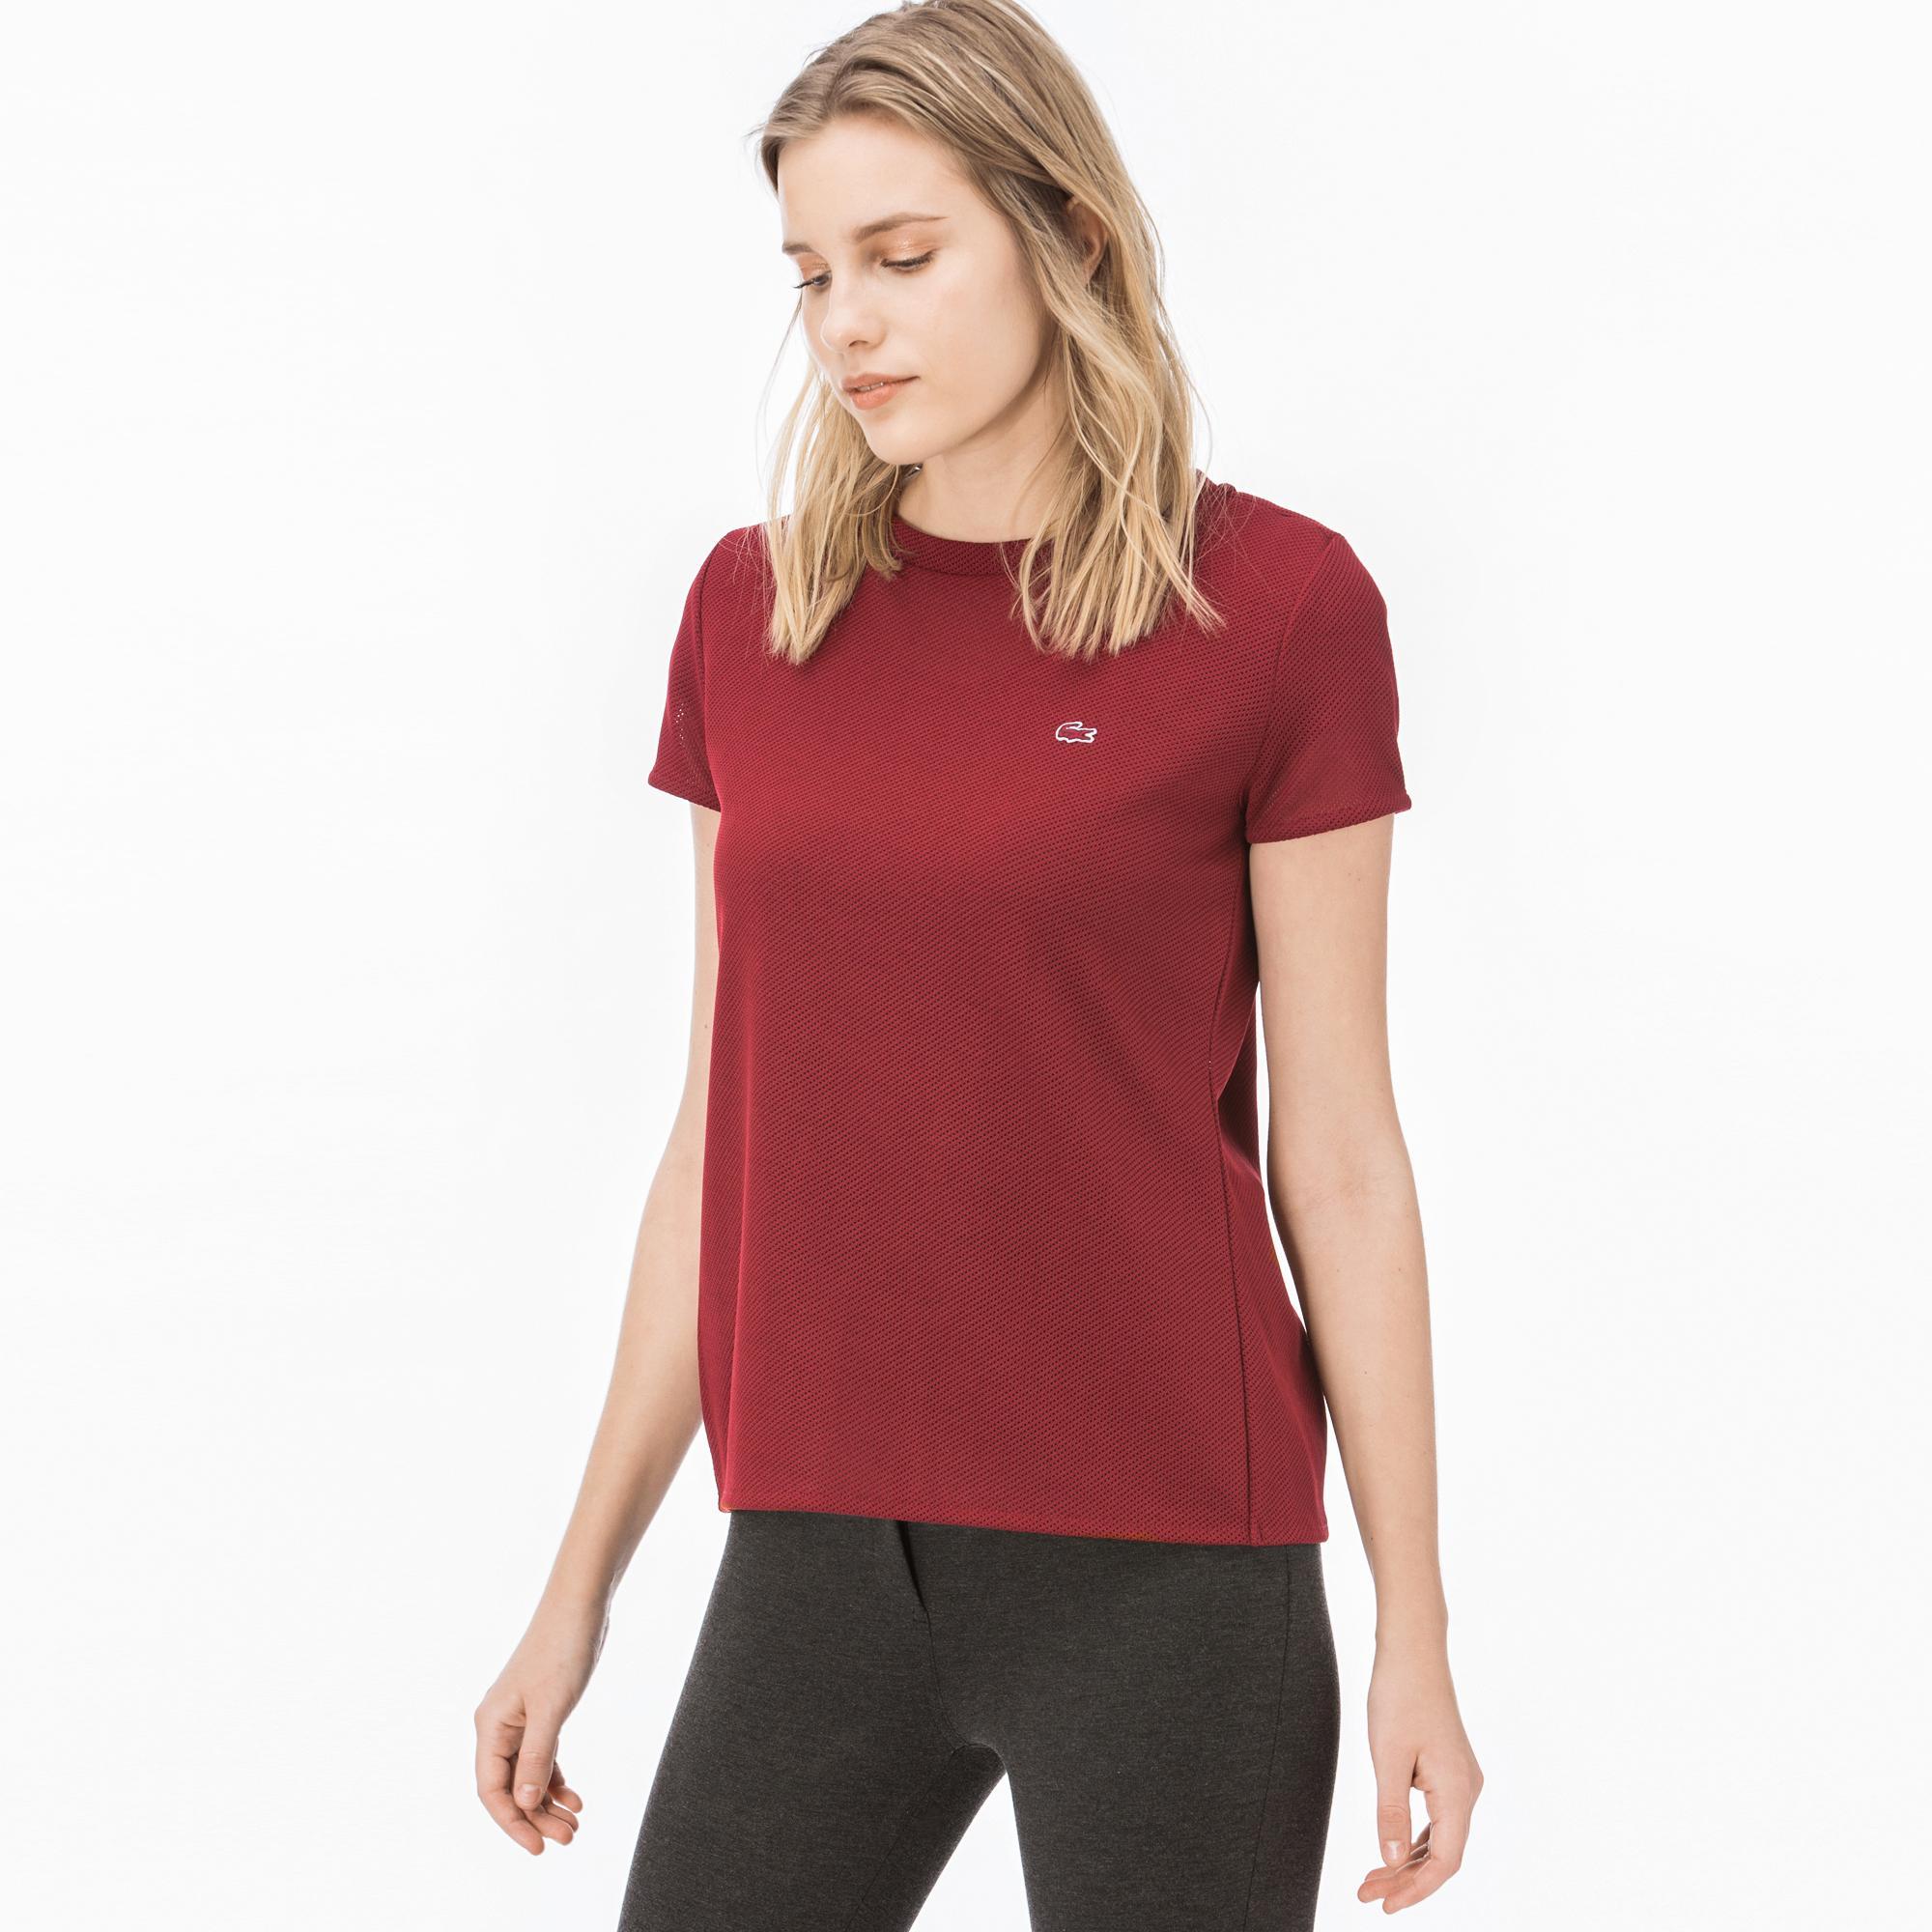 Lacoste Women's Short Sleeve T-Shirt